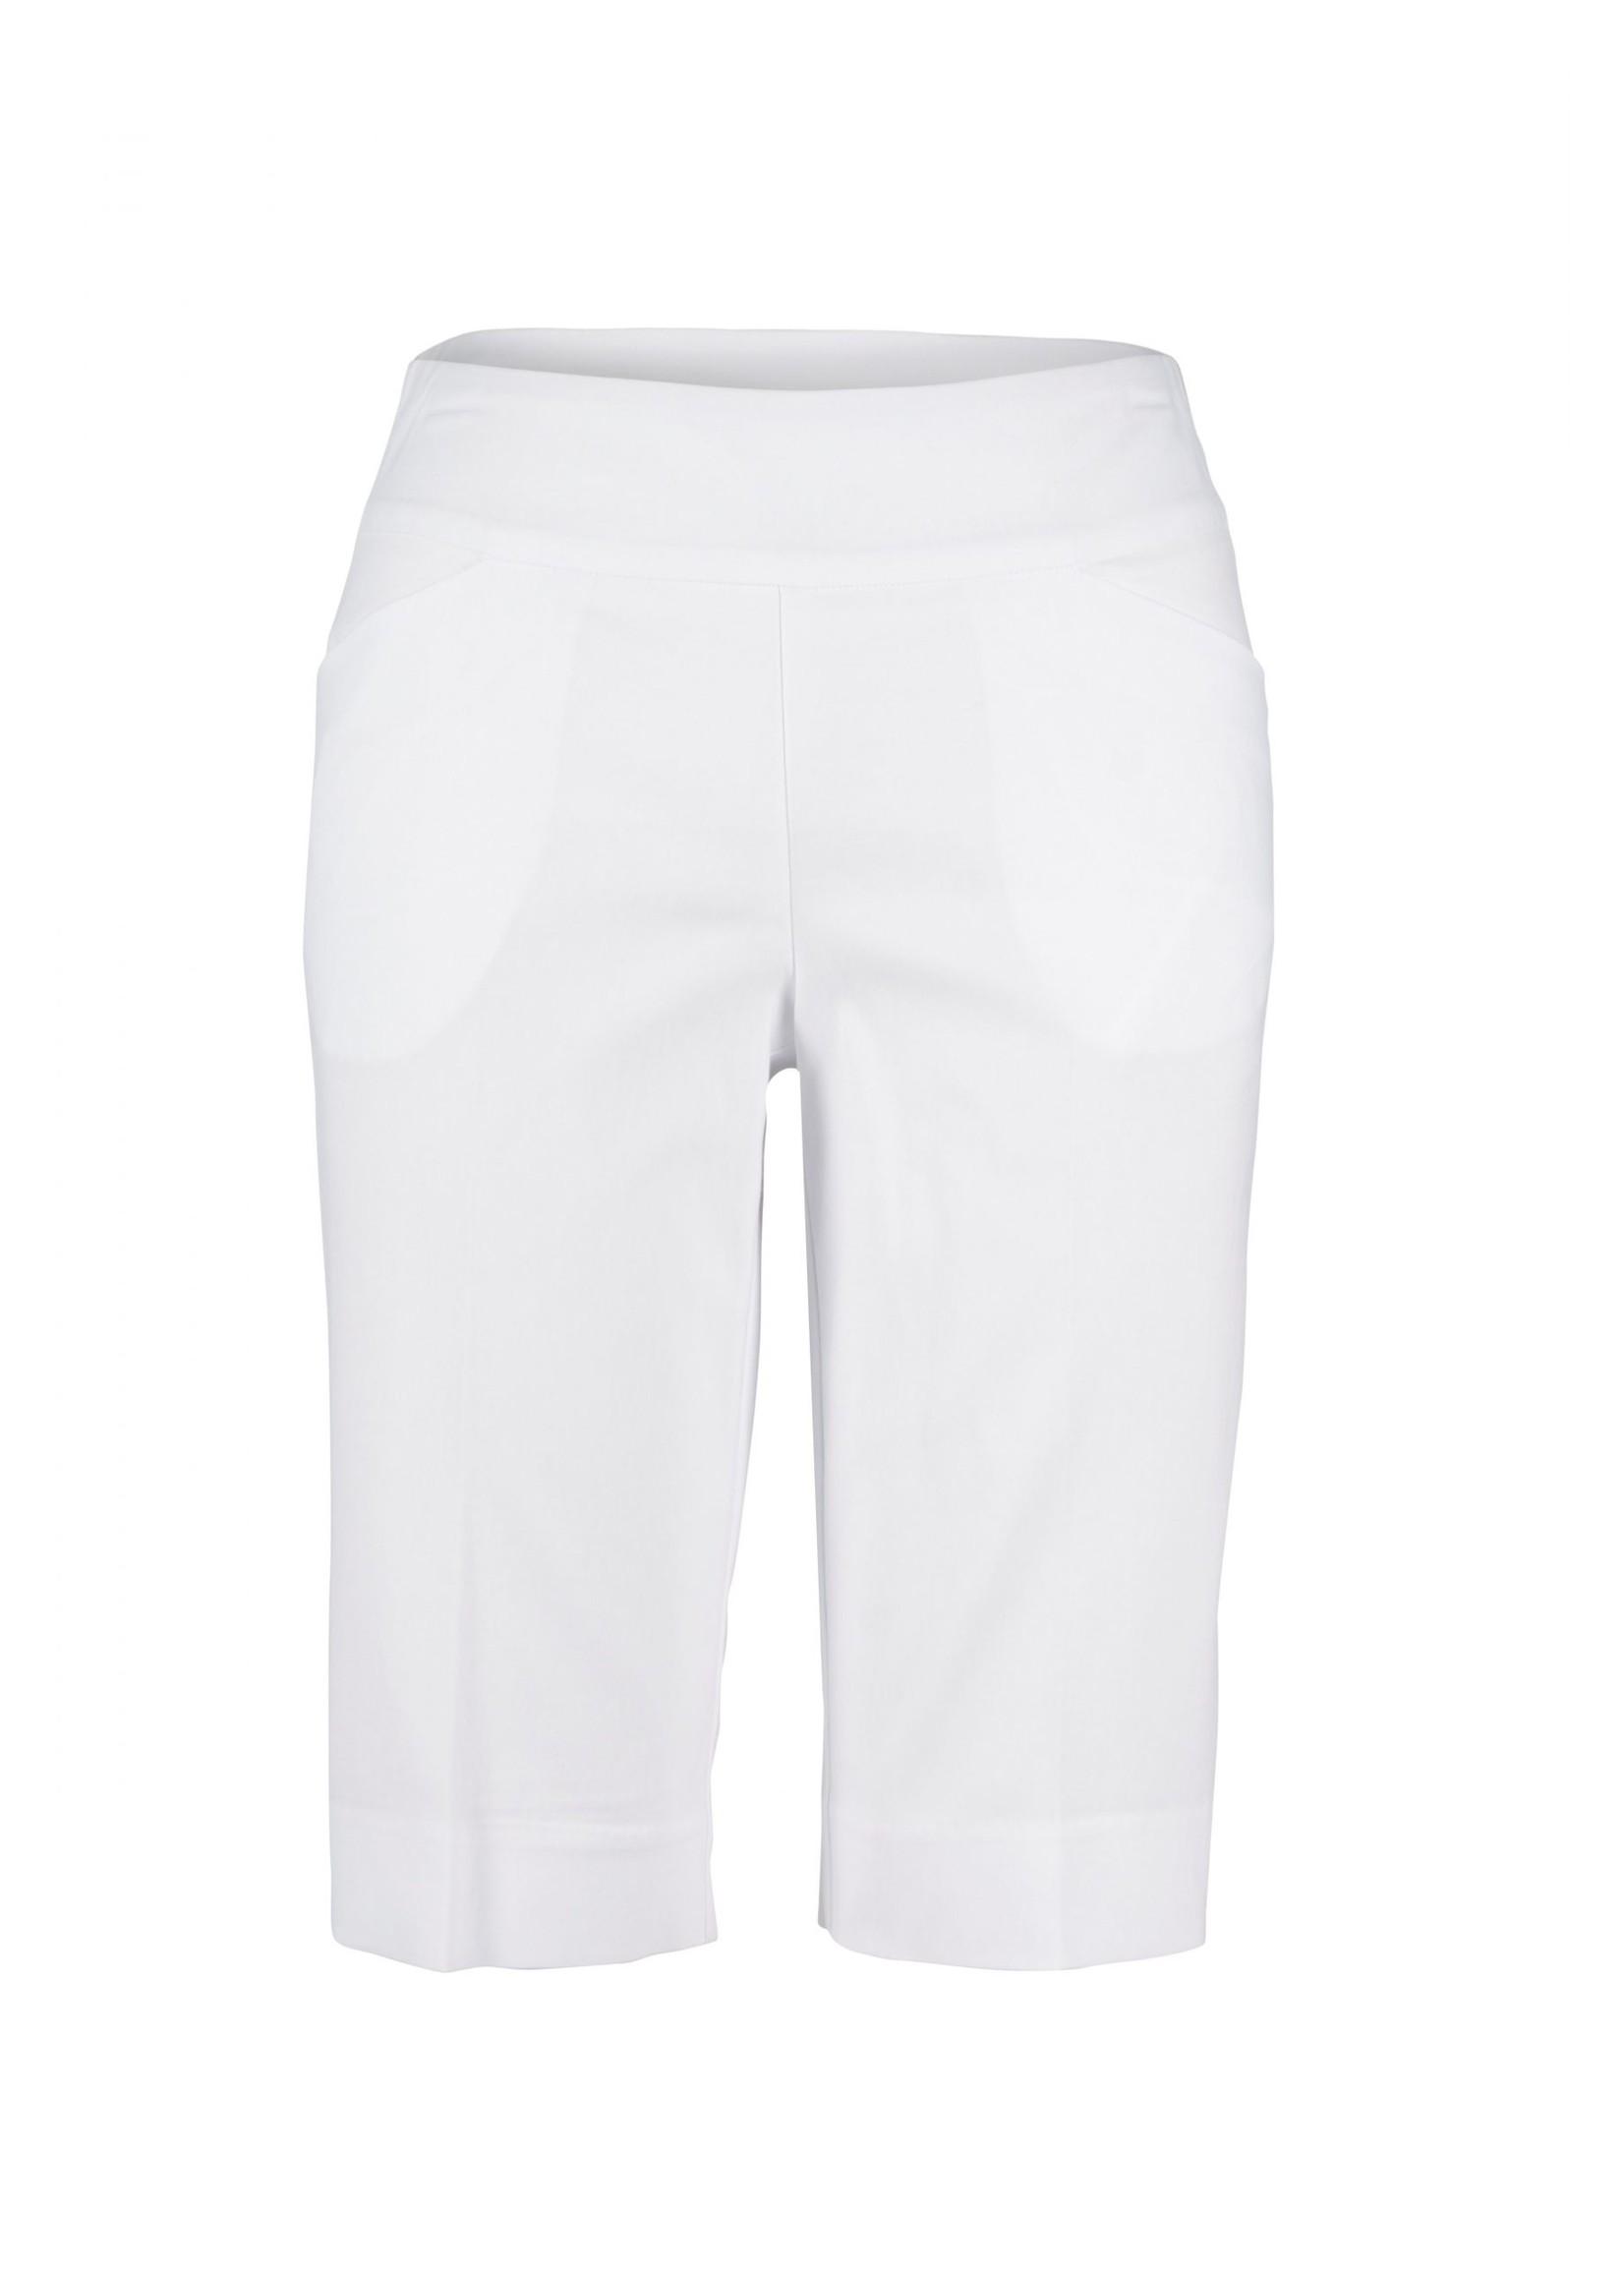 "Up Pants Bermuda Short 13"""